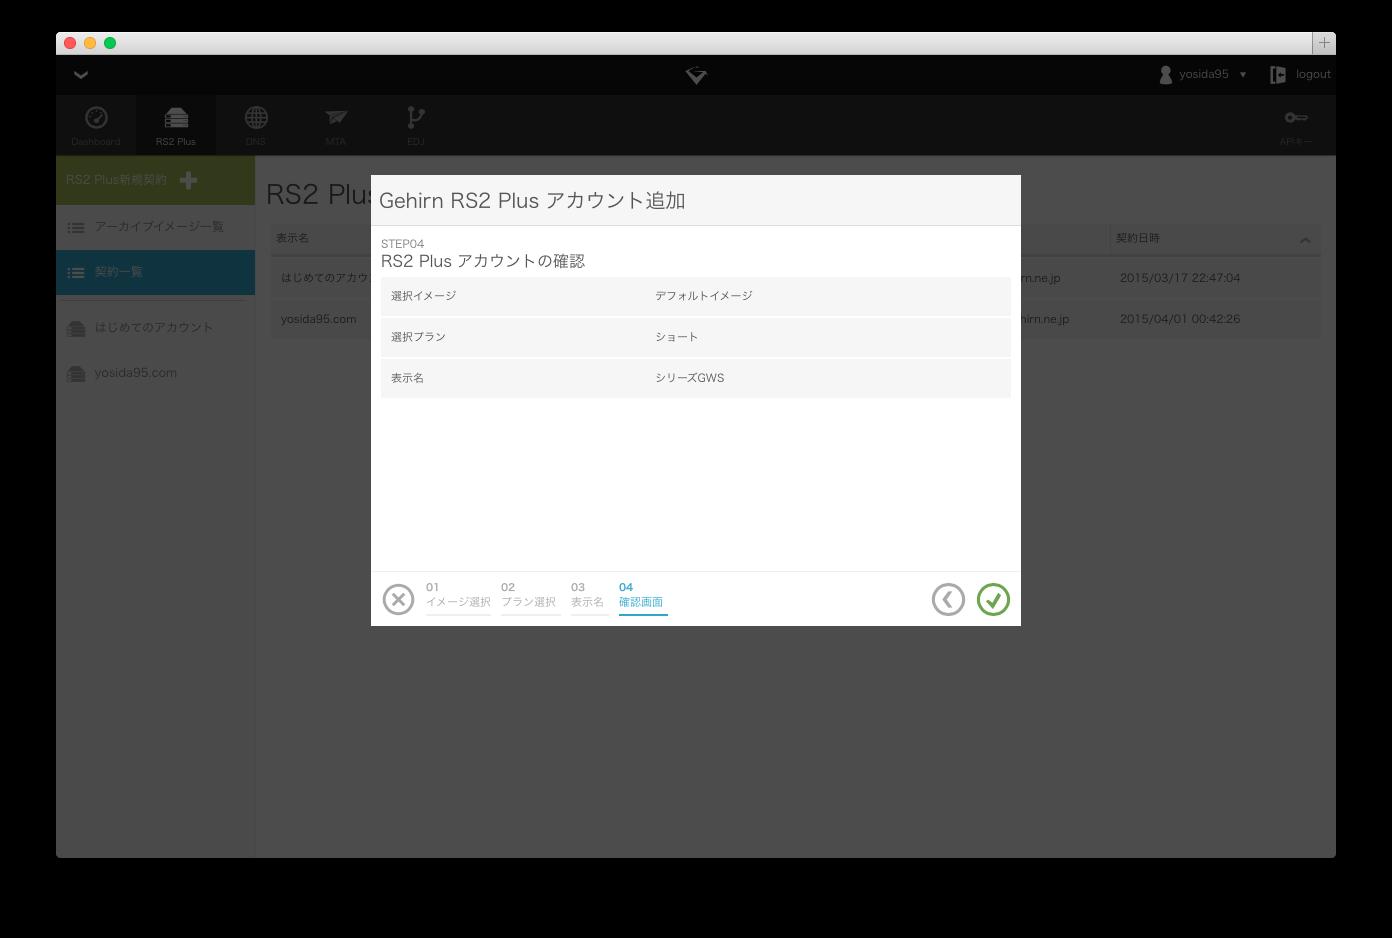 Gehirn RS2 Plus 新規アカウント作成 step4